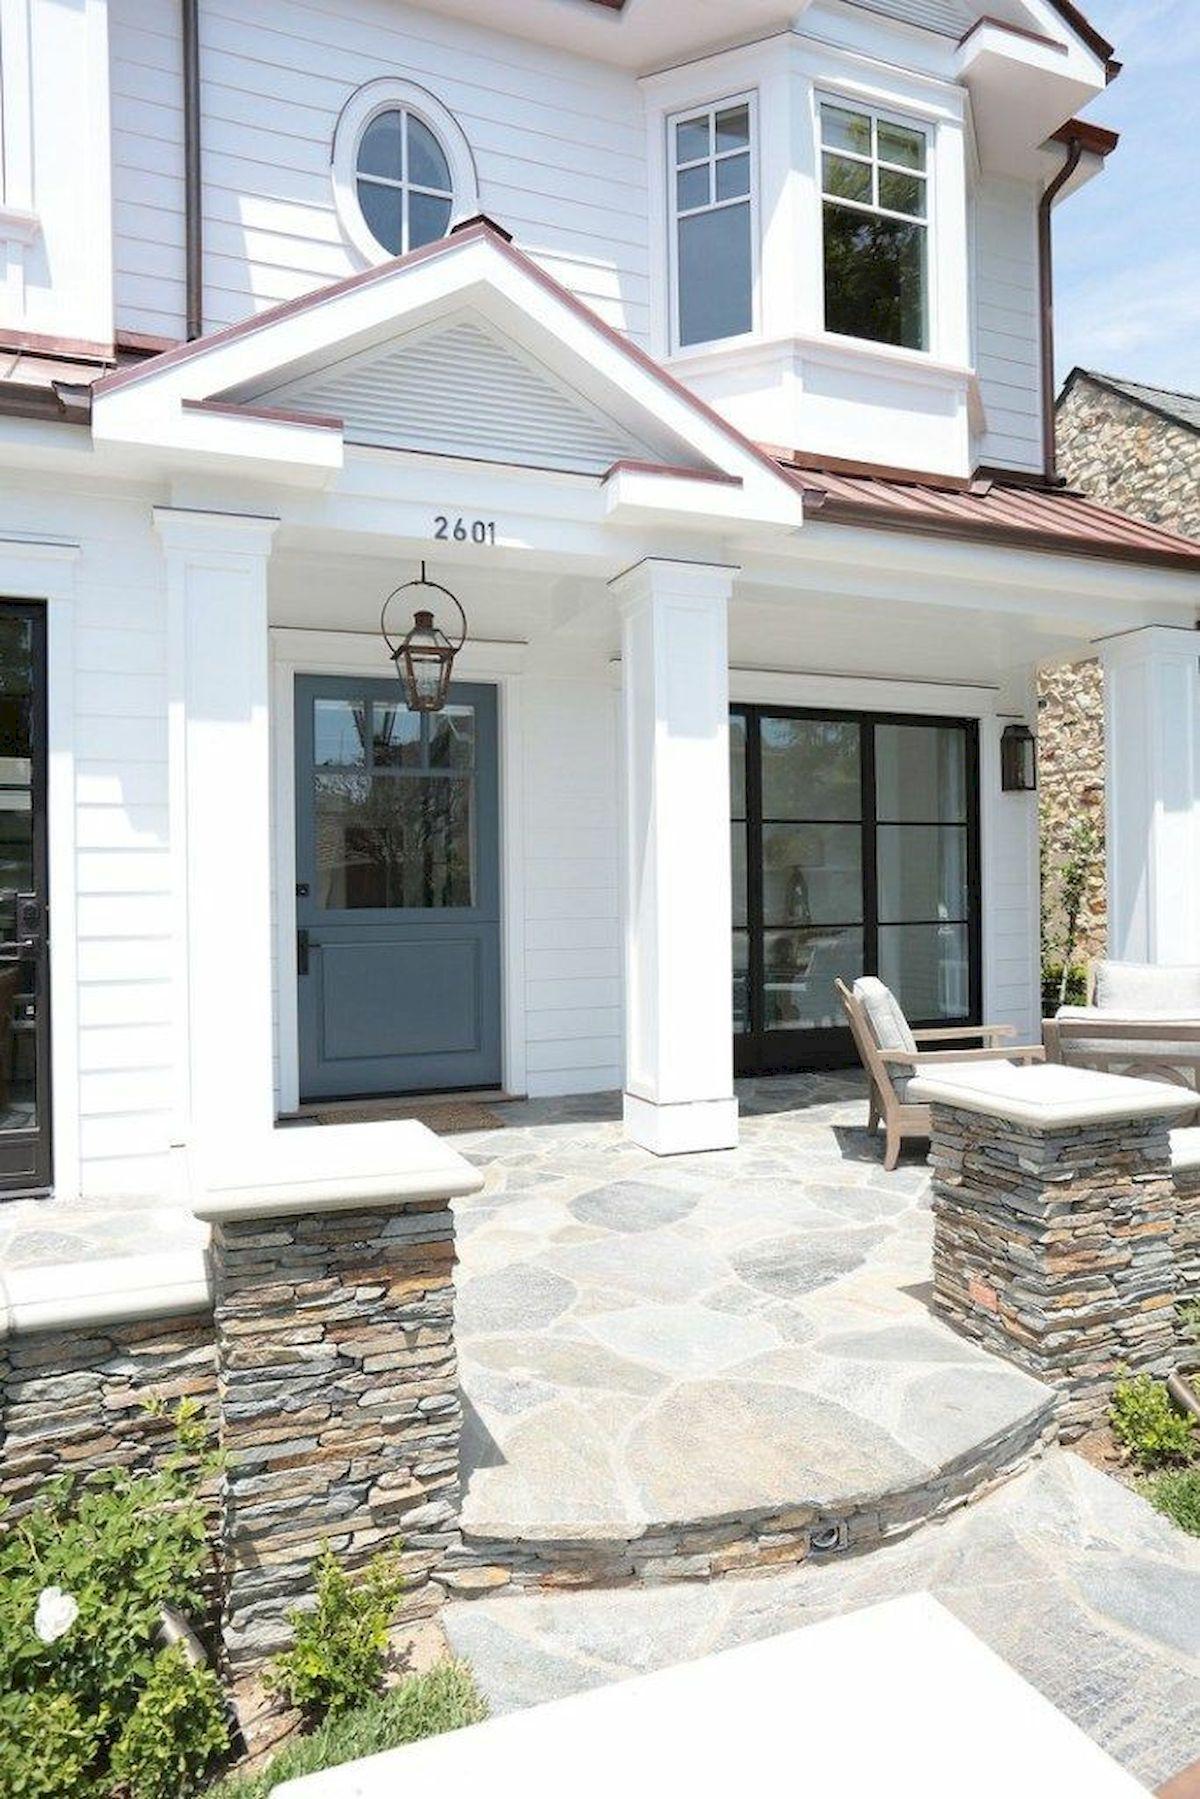 70 Stunning Exterior House Design Ideas (70)